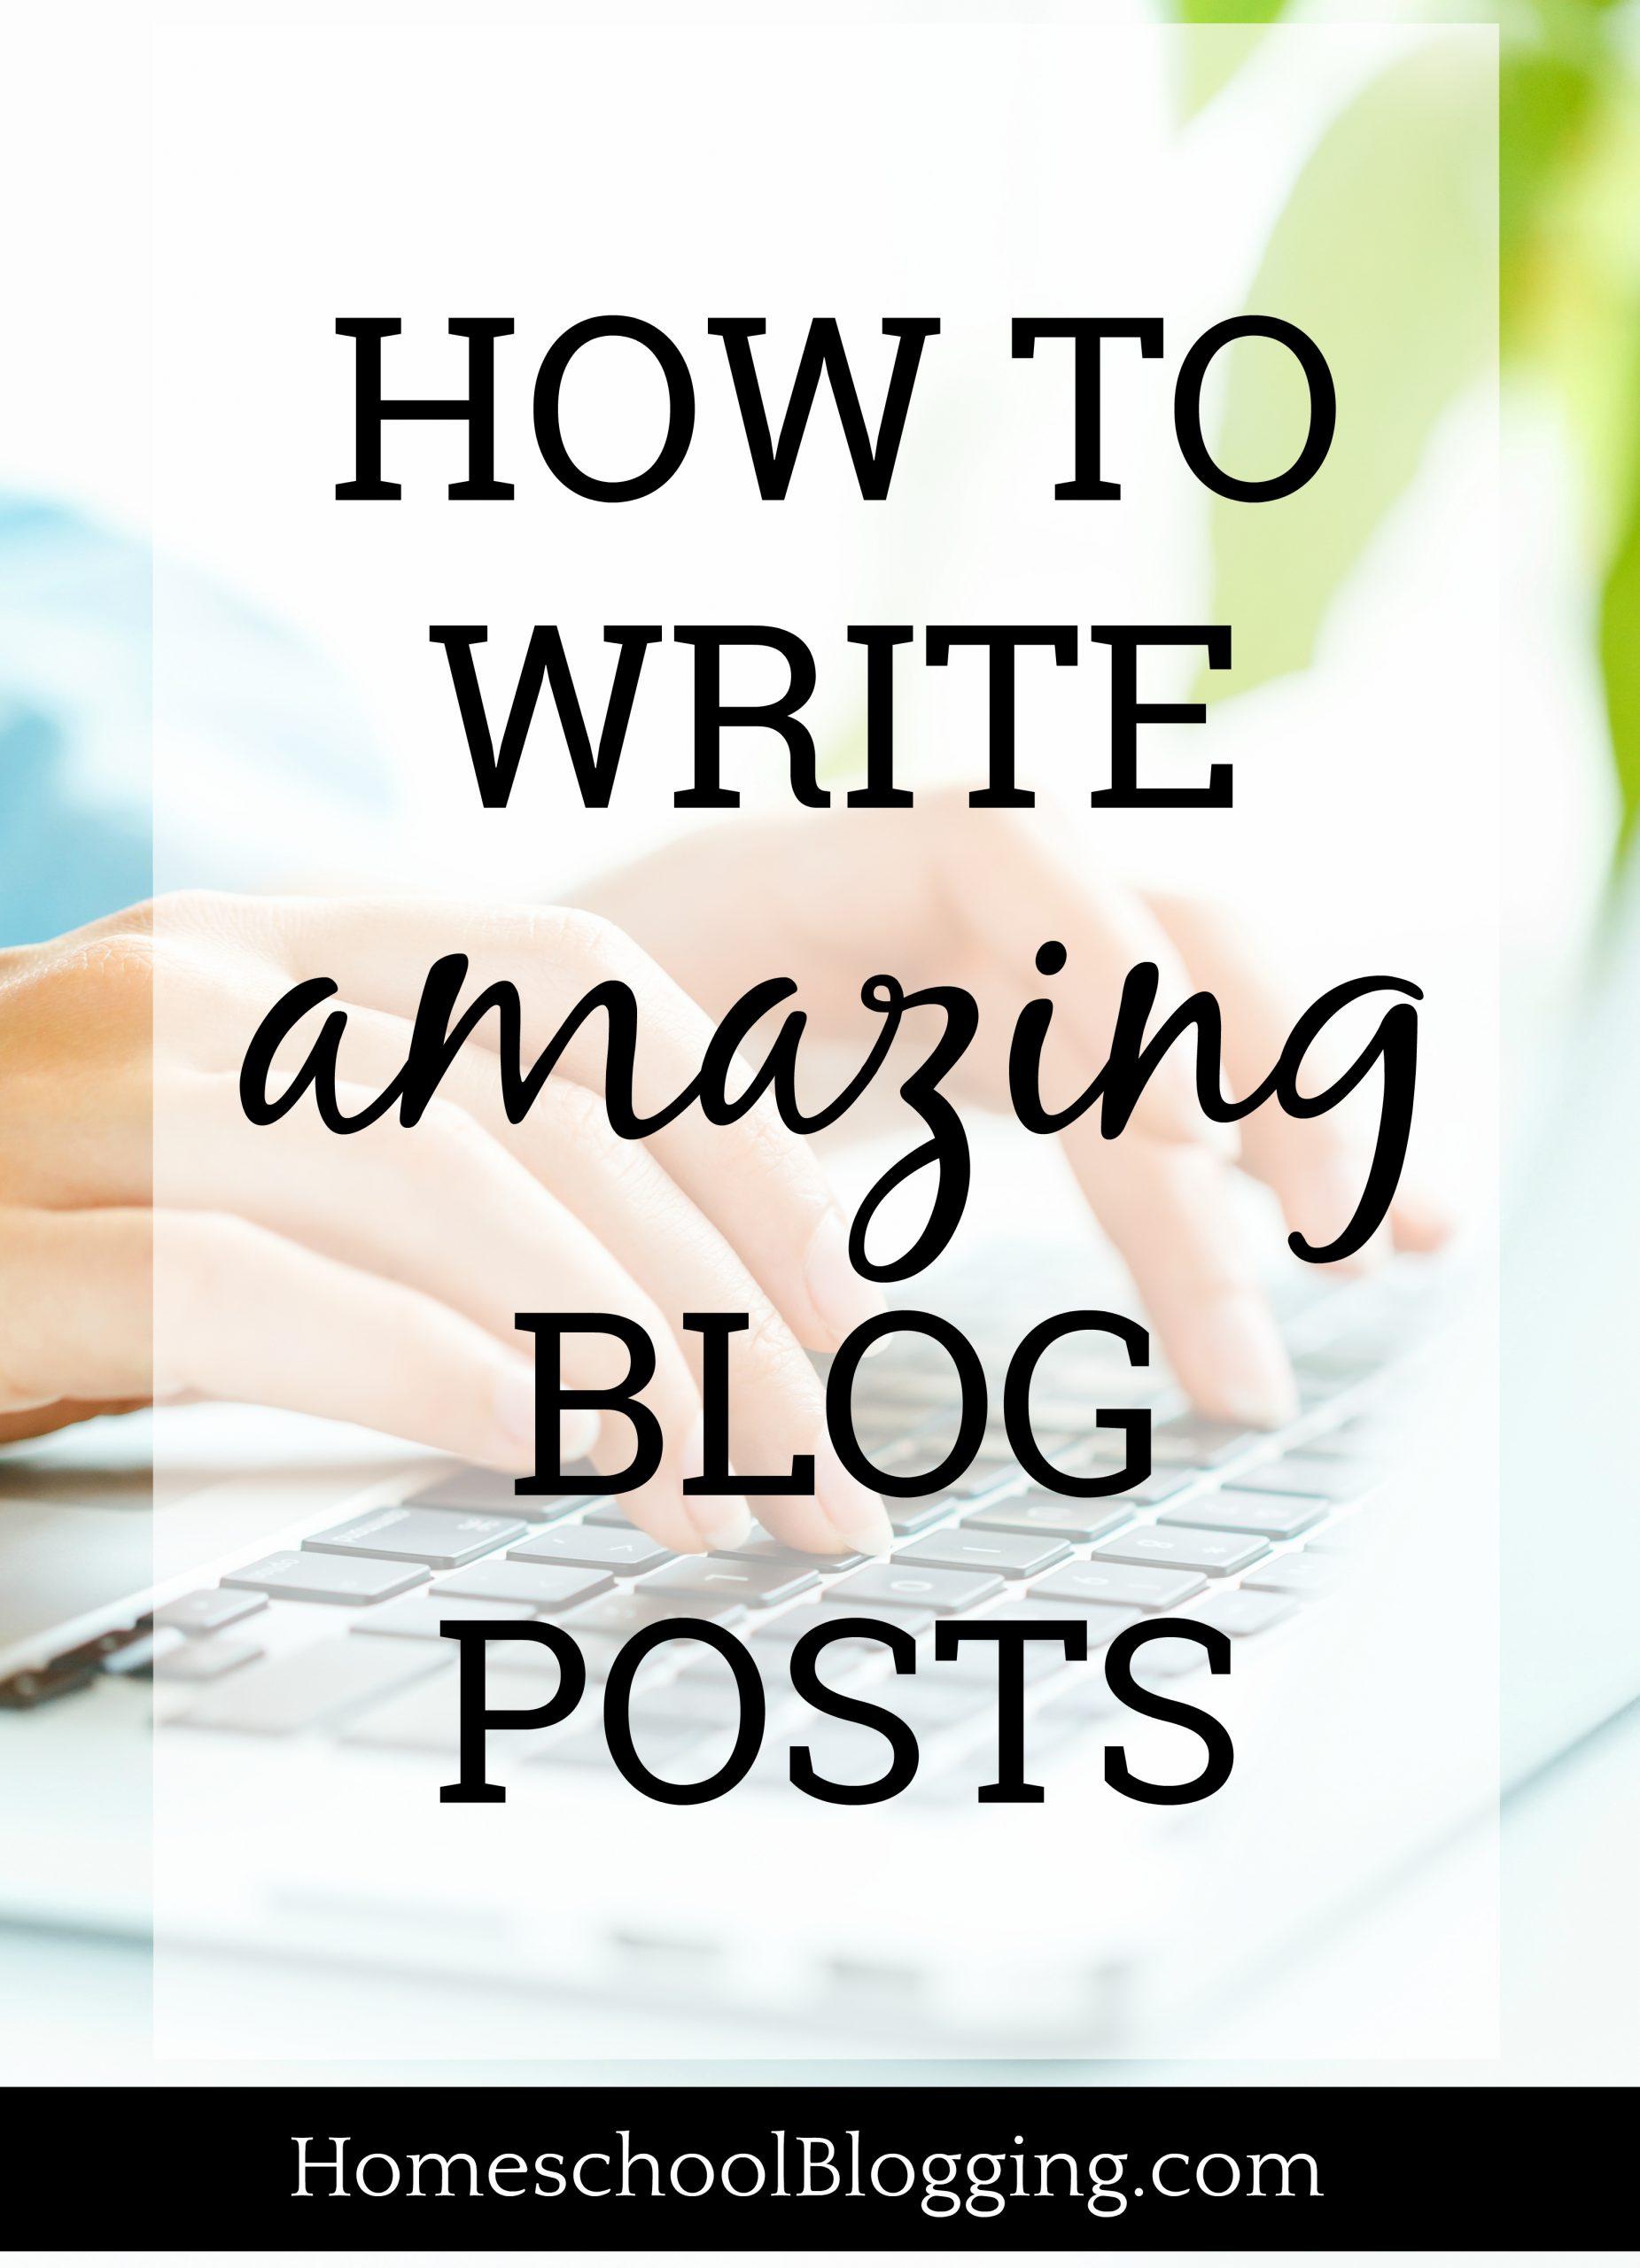 How To Write Amazing Blog Posts